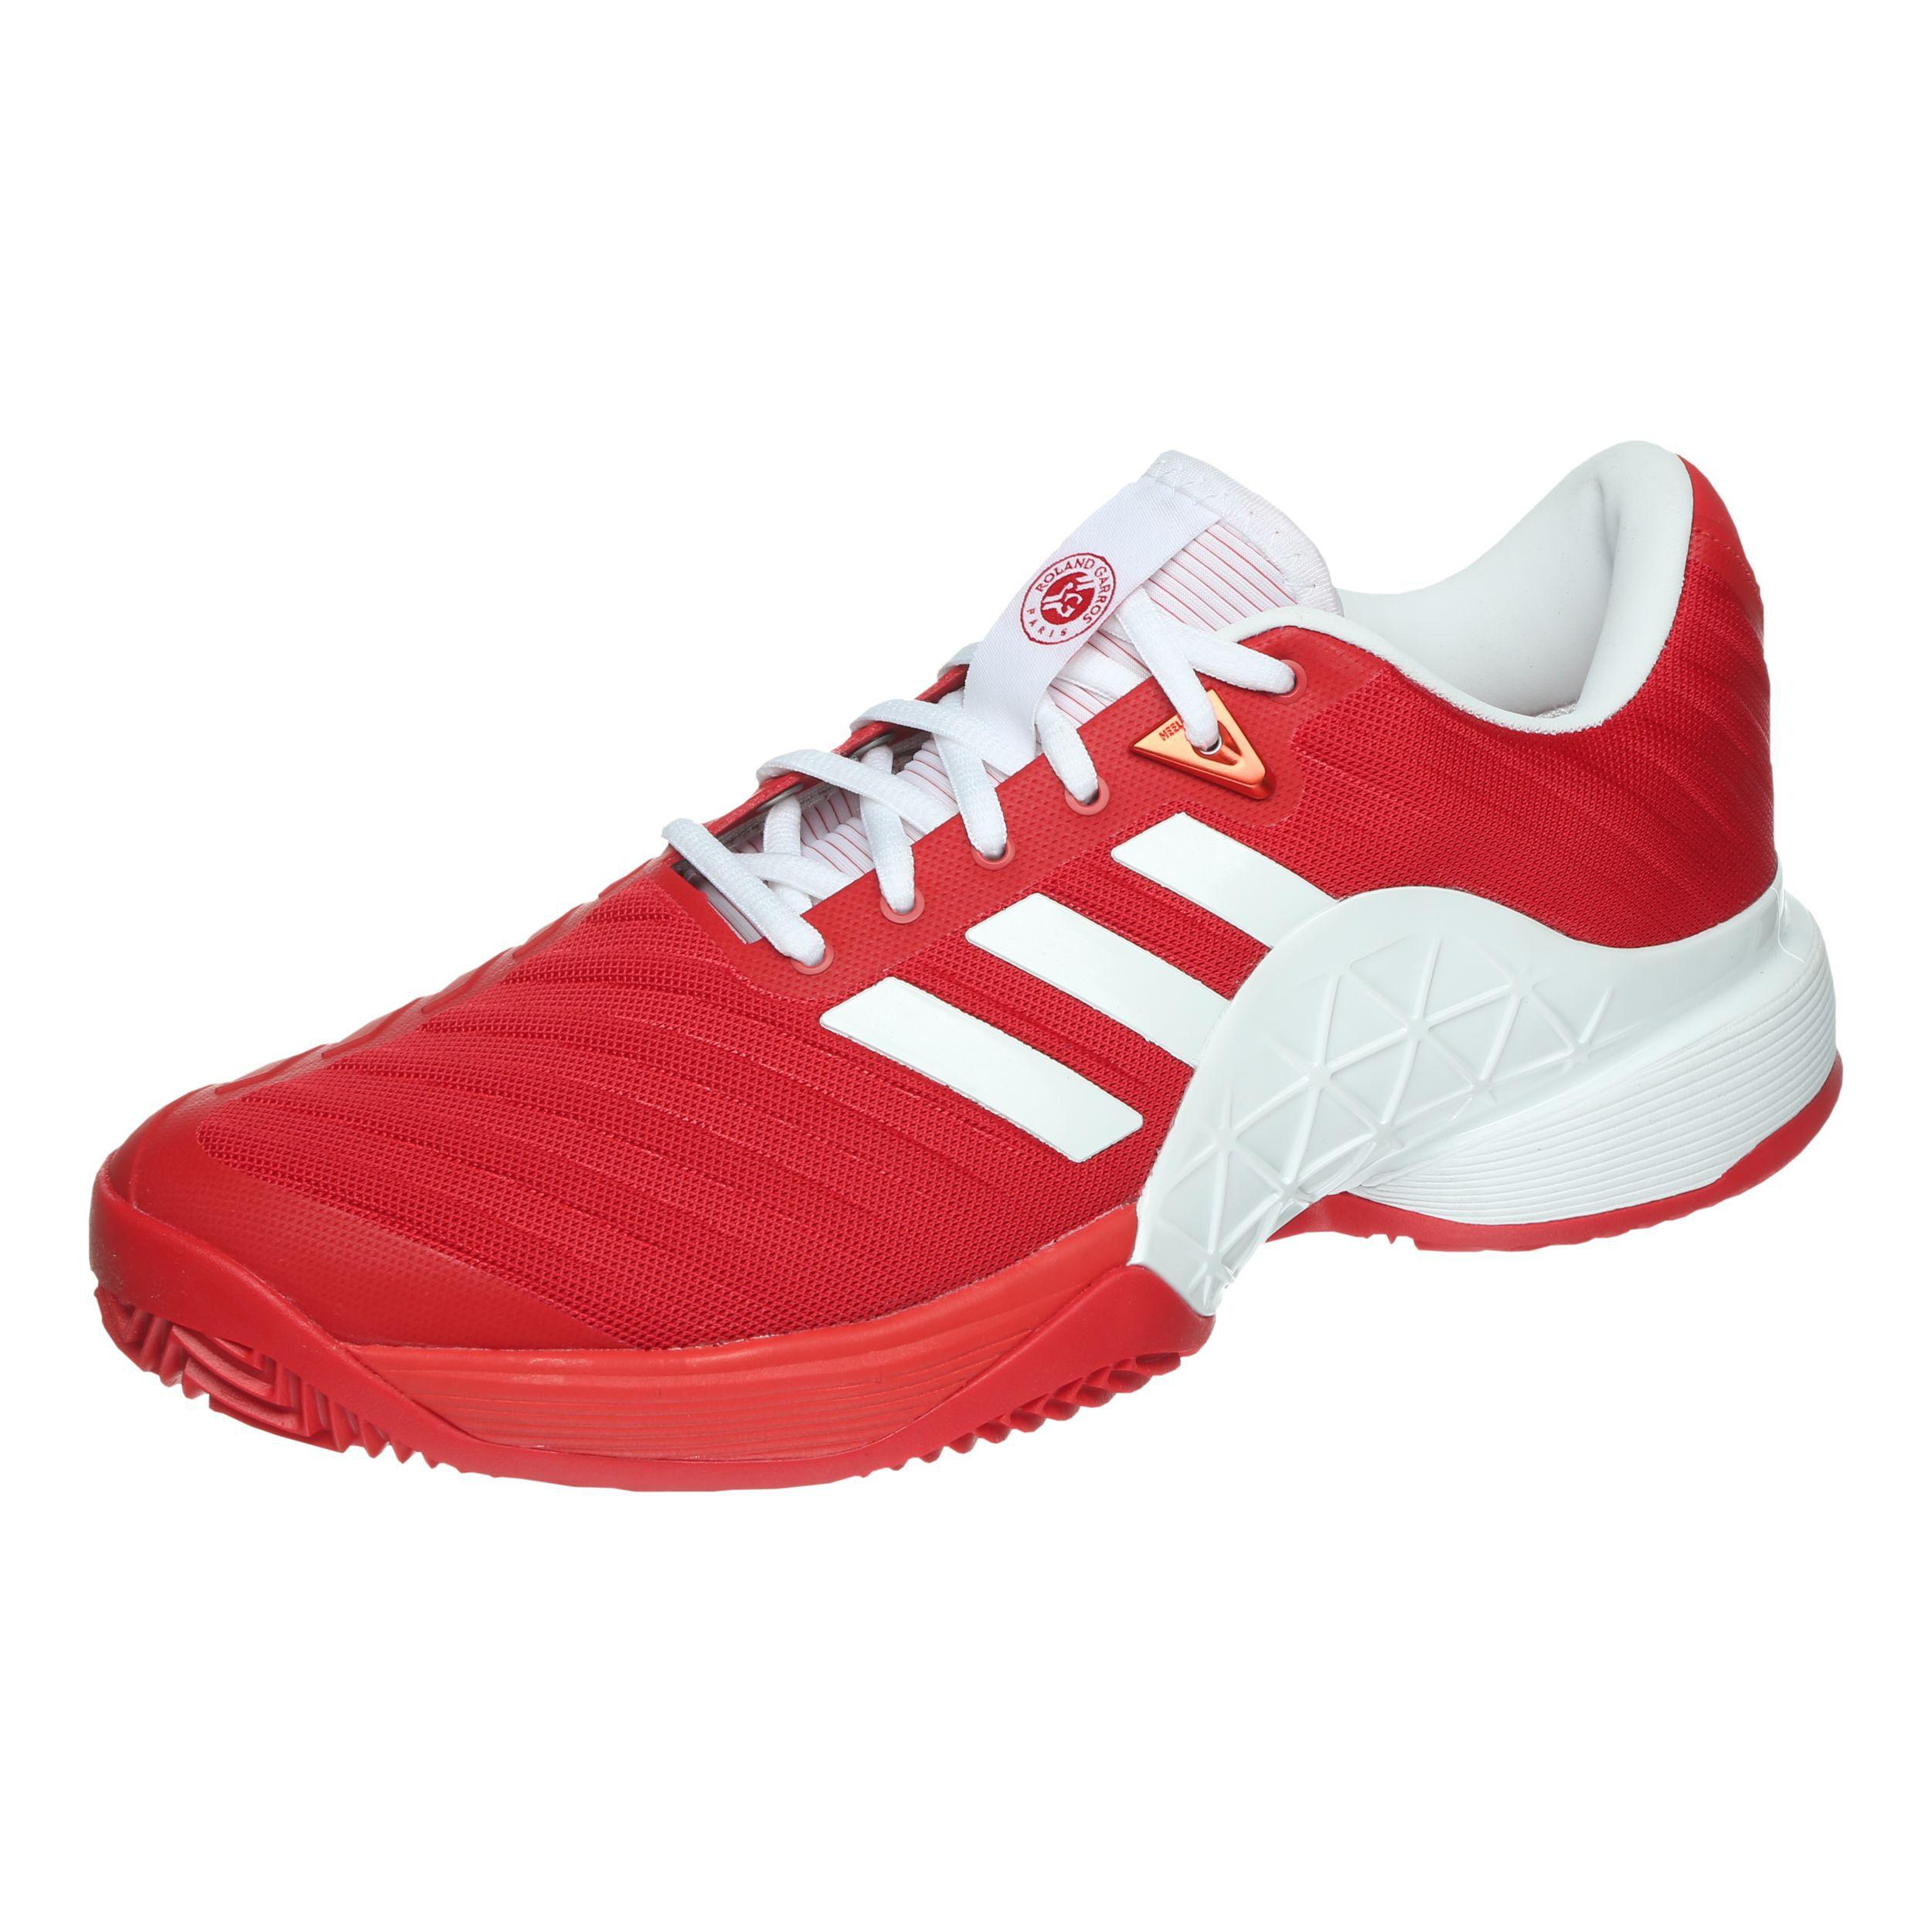 adidas tennisschuhe barricade clay herren 43 1 3